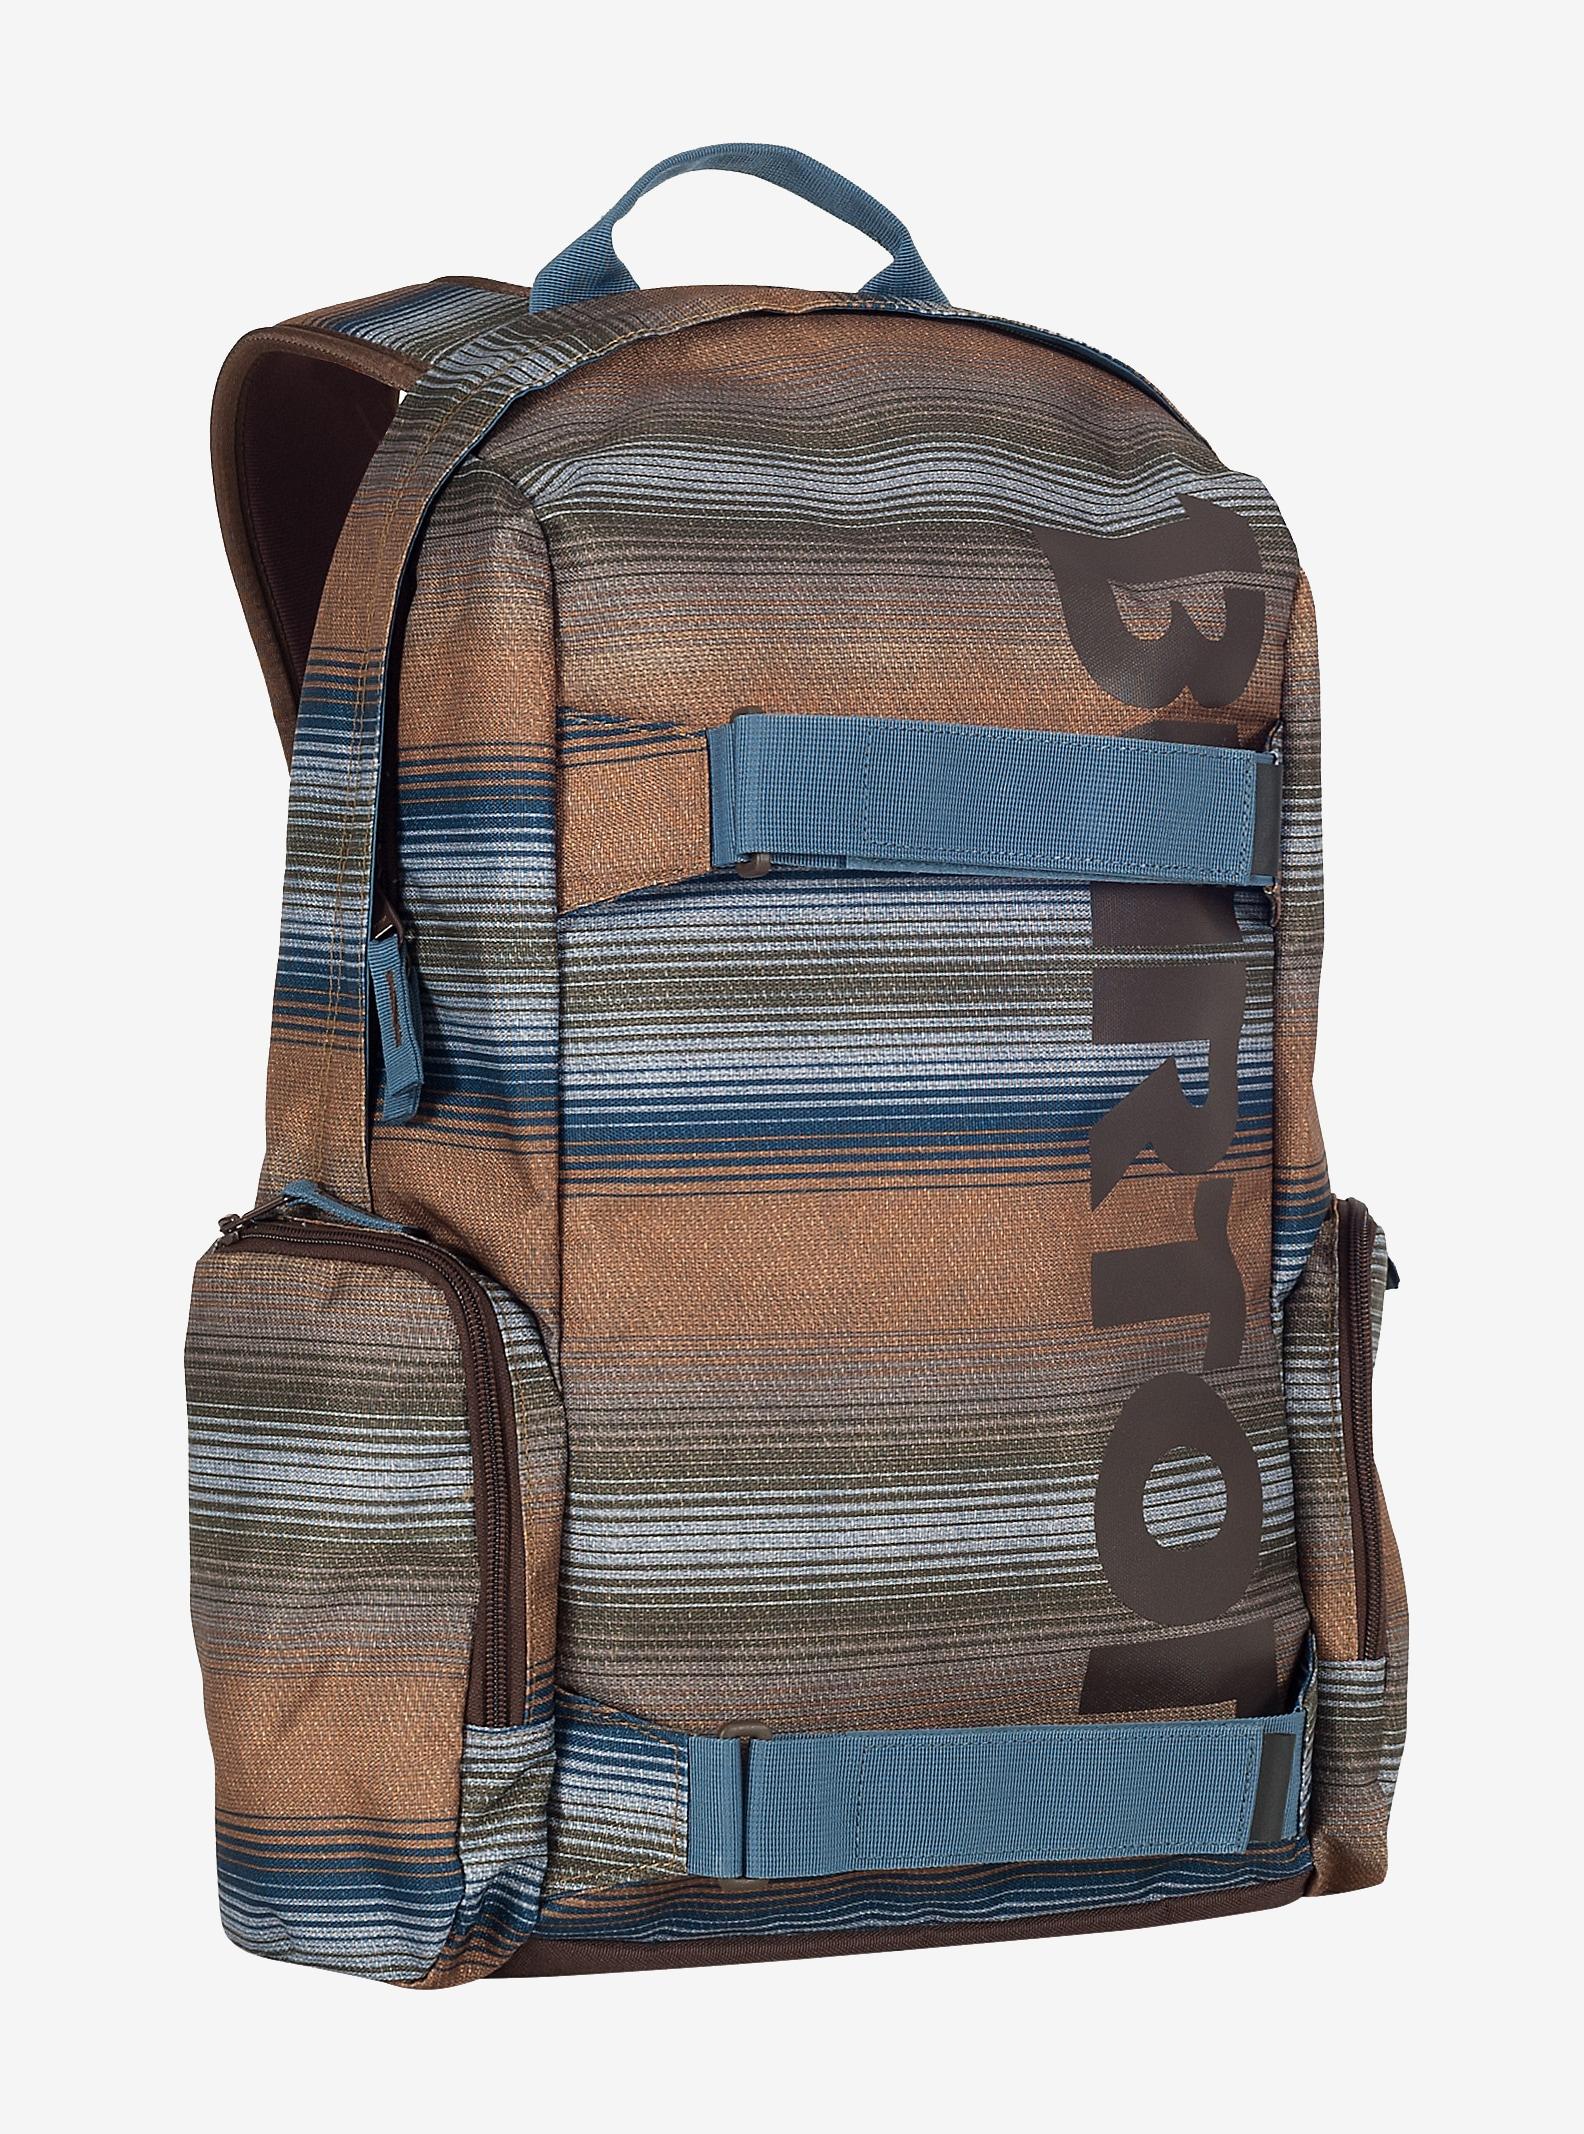 Burton Emphasis Backpack shown in Beach Stripe Print